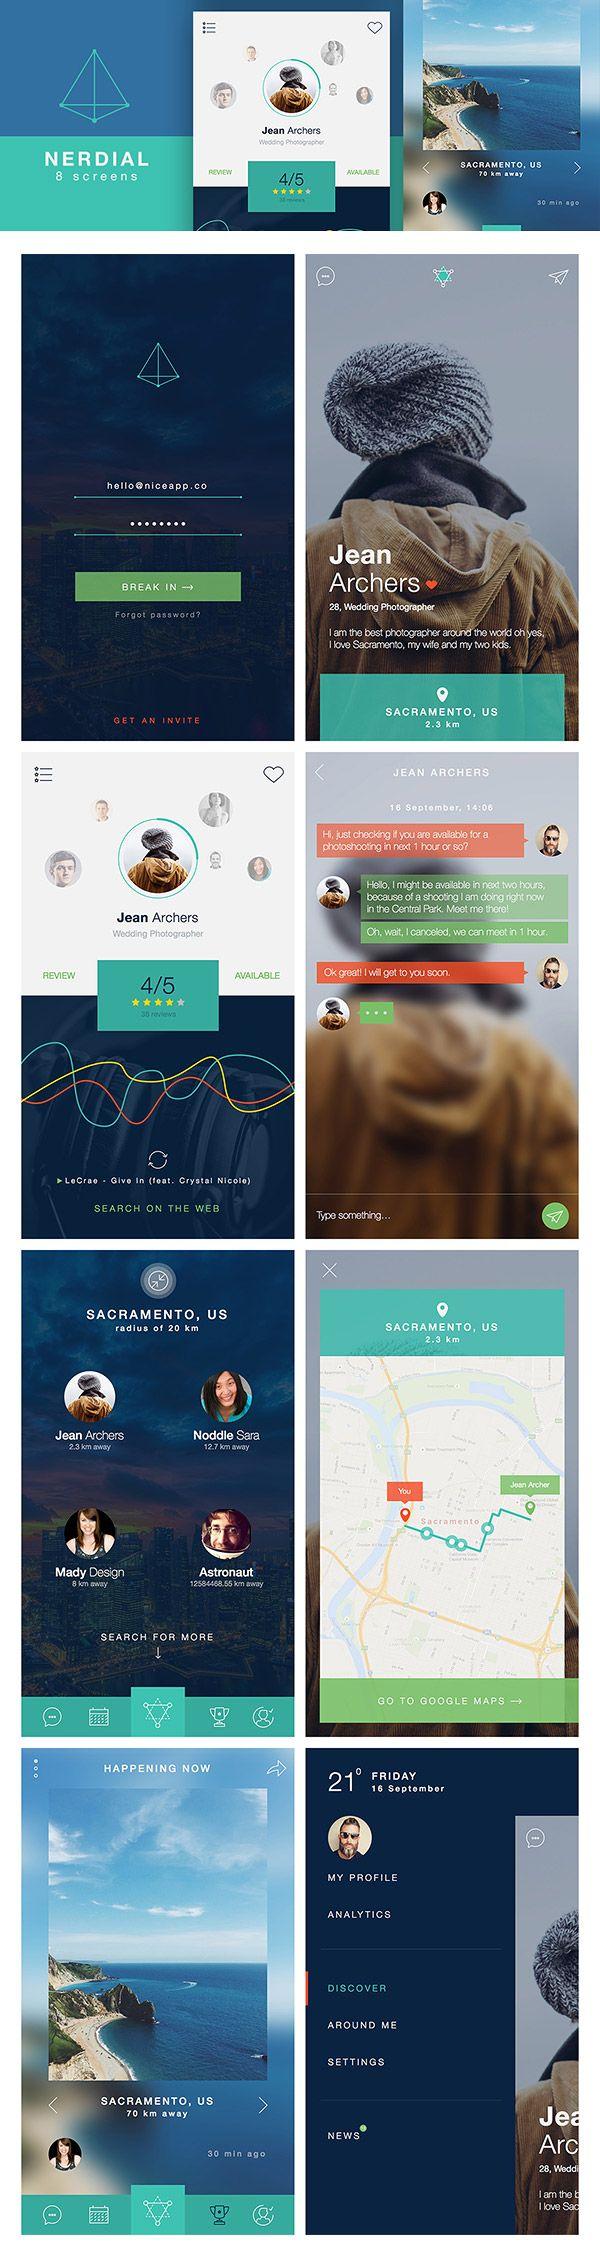 Nerdial App UI - Antara's Diary